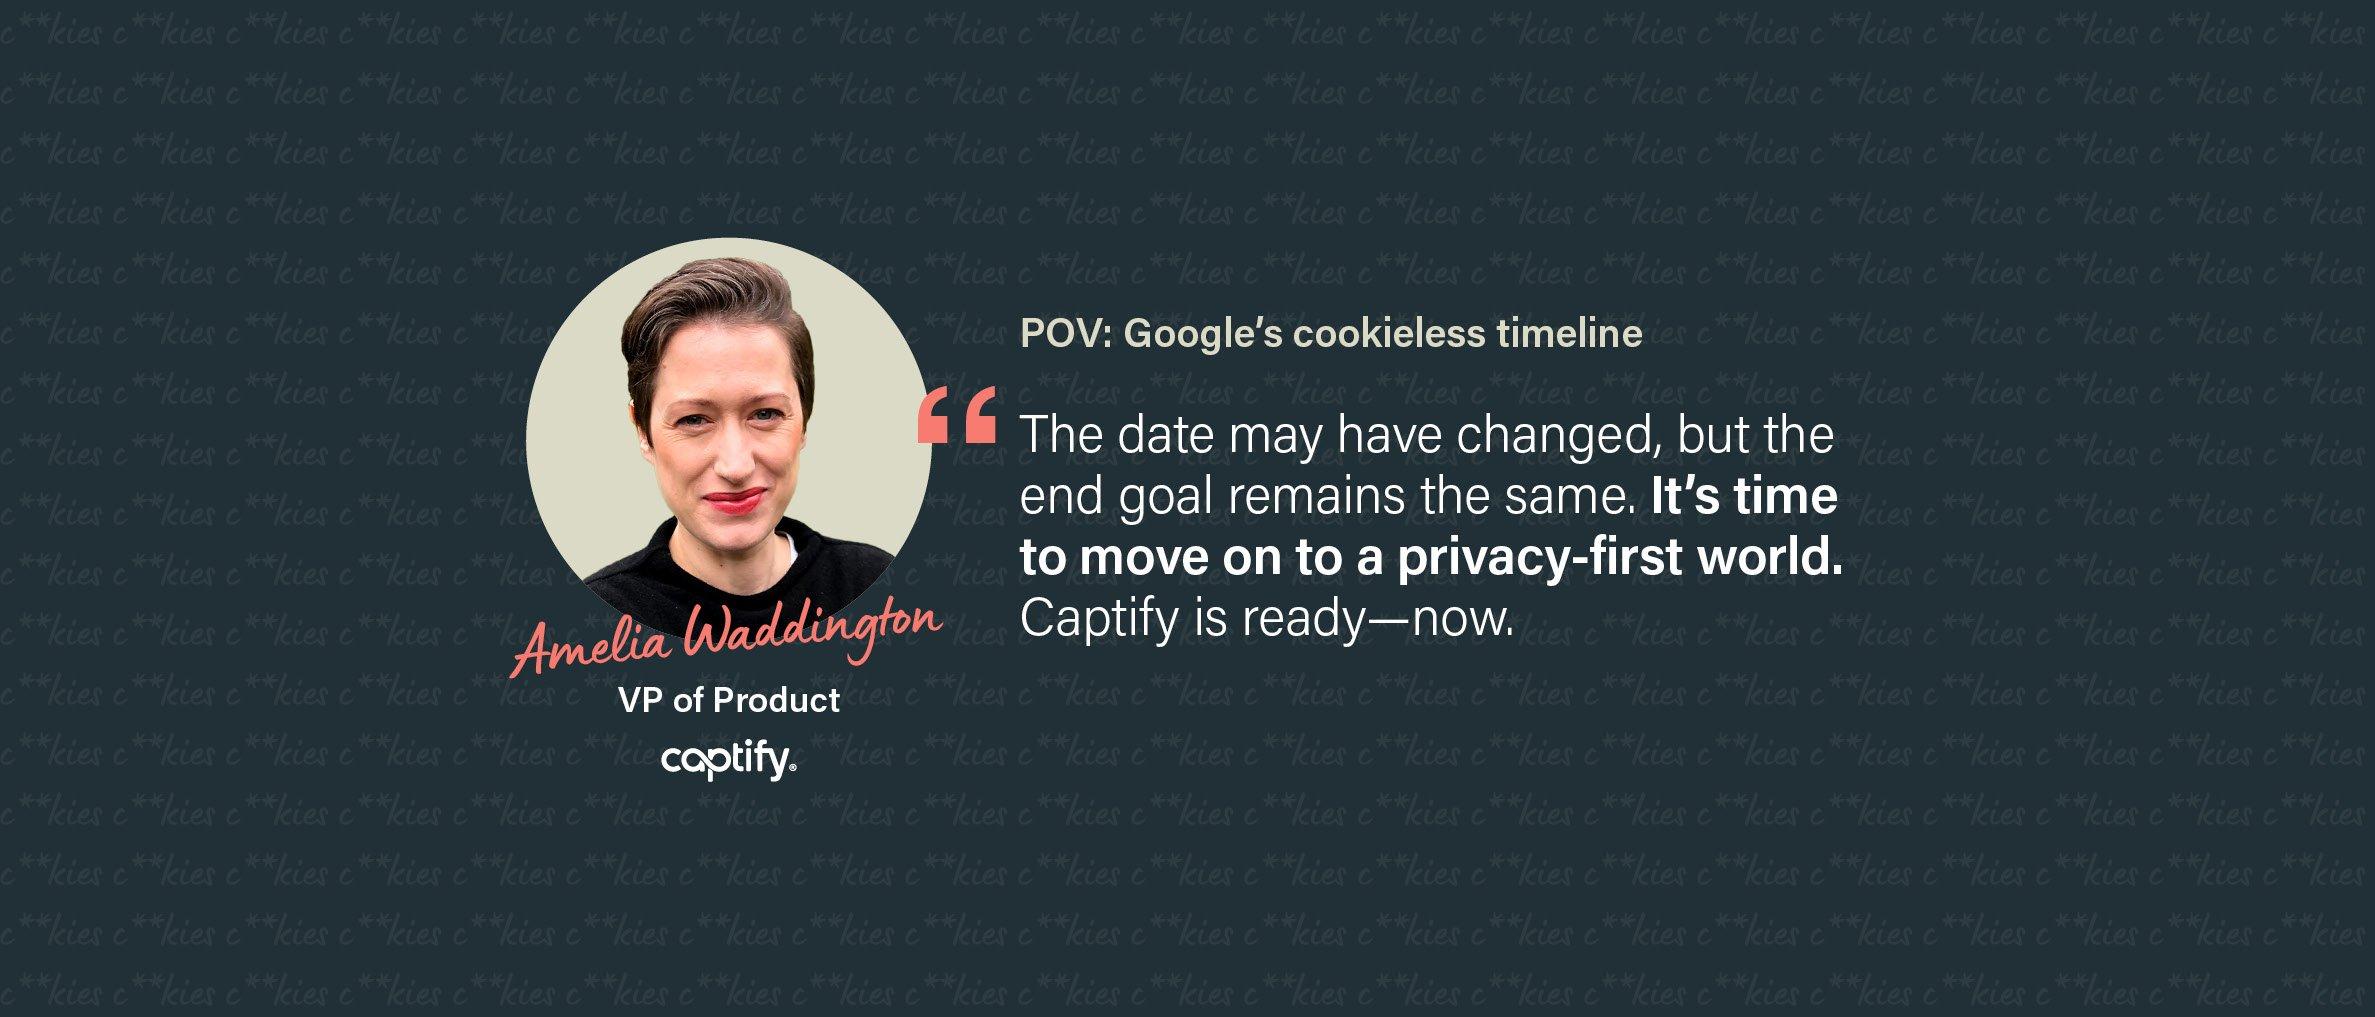 Captify POV: Google's Cookieless Timeline